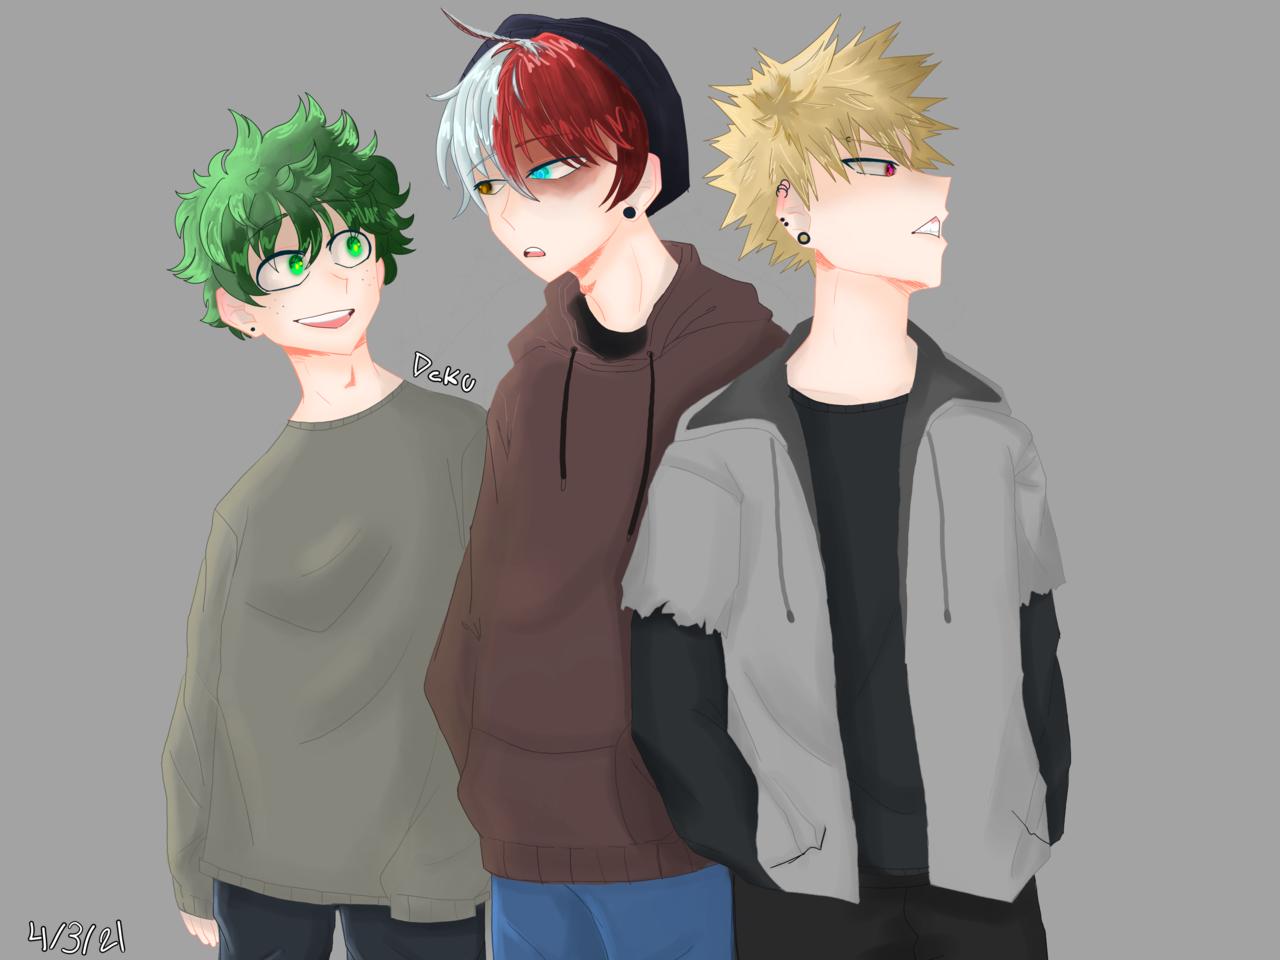 The boys  Illust of Dekuchan_336(crazy mode?) medibangpaint Bakugoufanart fanart dekufanart Fingerpaint digital anime heheColorful todorokifanart MyHeroAcademia